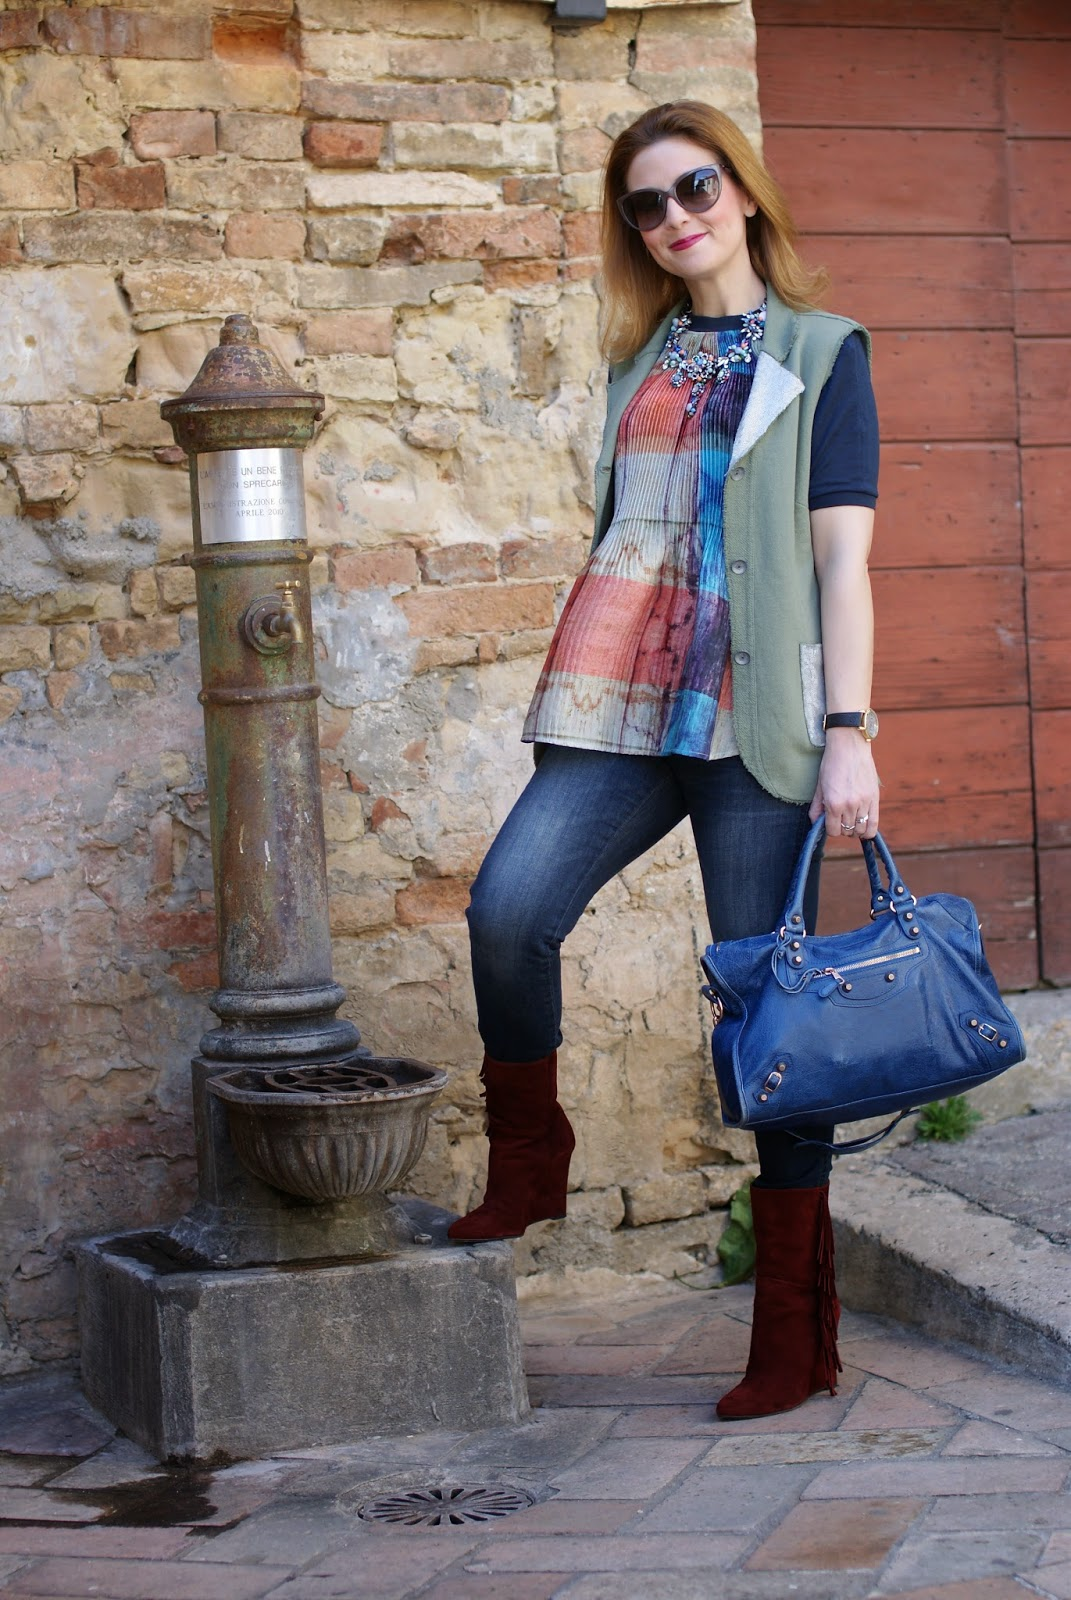 fringed boots, Praio sleeveless jacket, Millelire orologio, Balenciaga City, Fashion and Cookies, fashion blogger